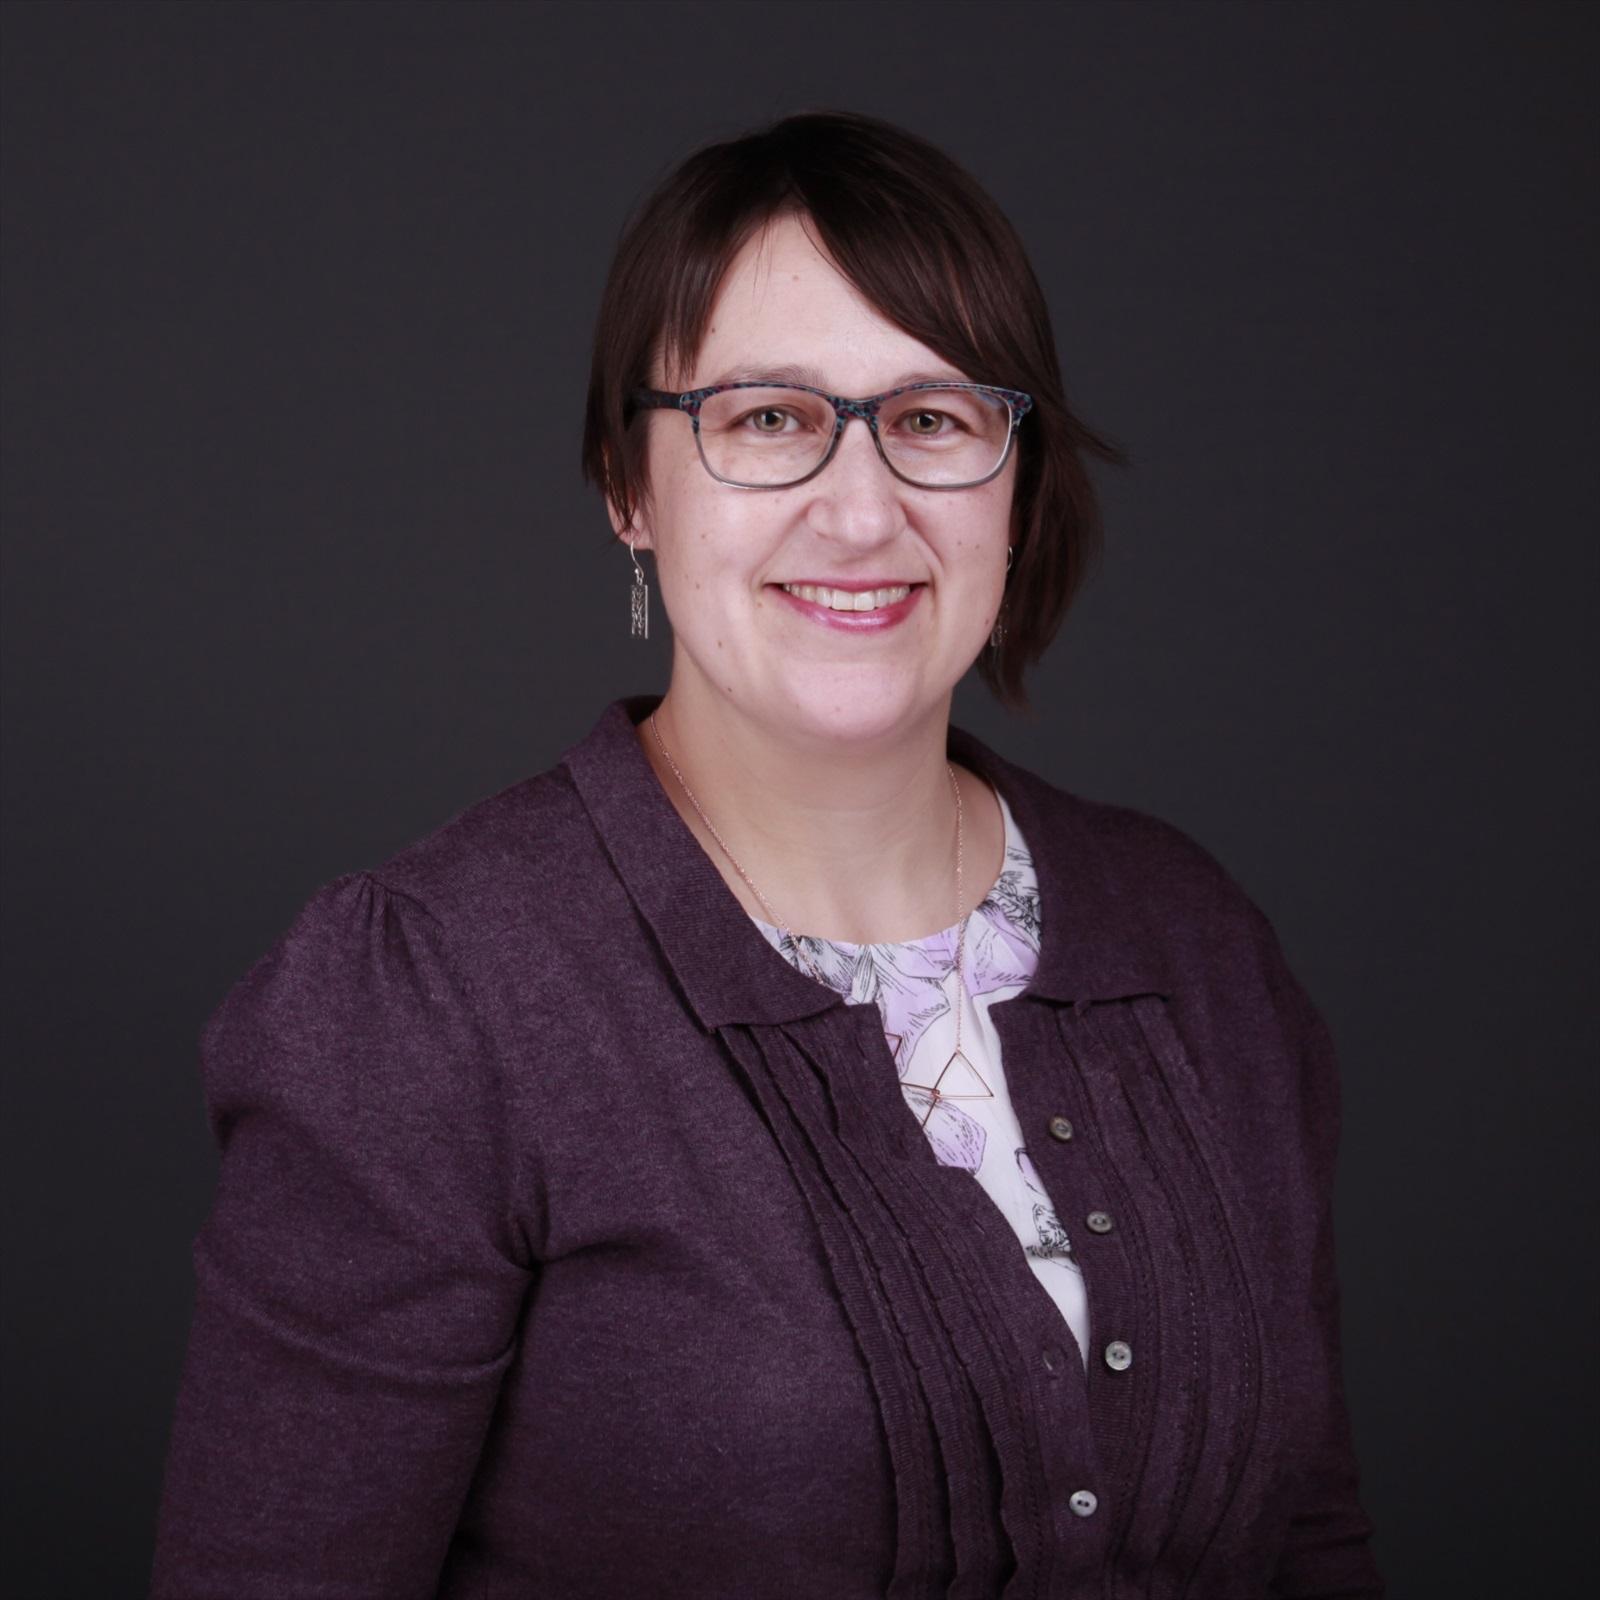 Chantale Boileau, Community Librarian